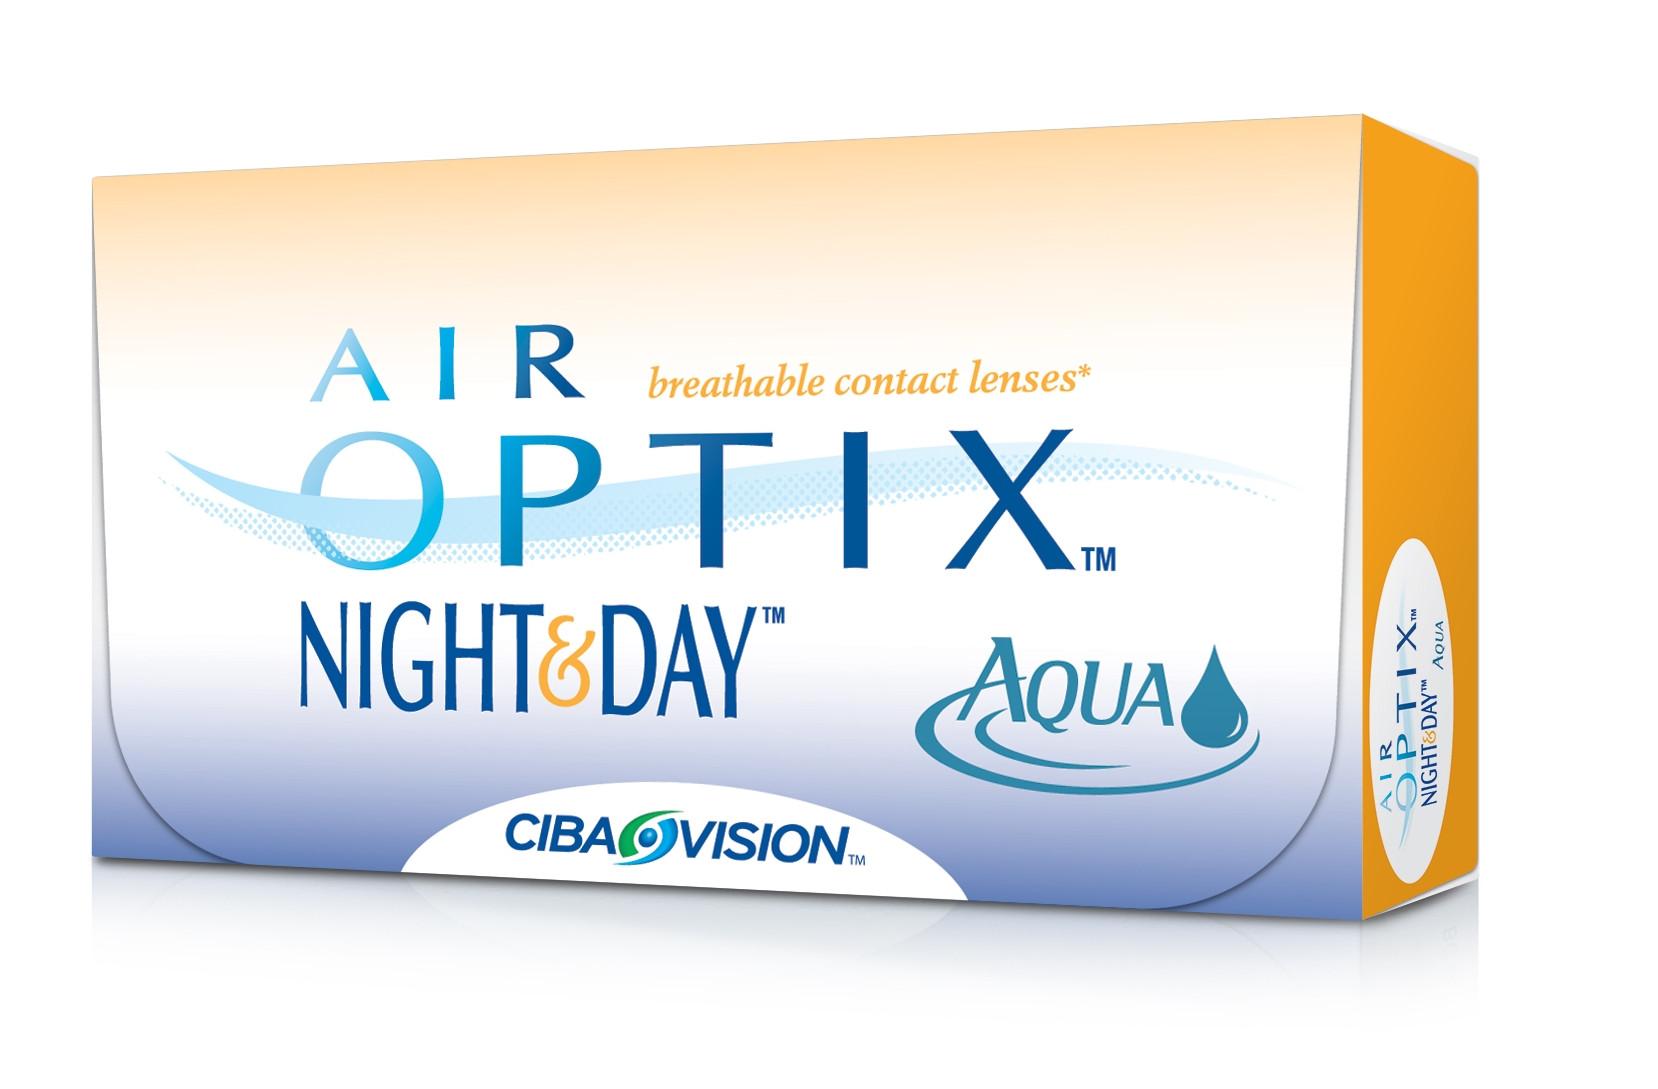 c042ebf906b96 Air Optix Night and Day Aqua (6) lentes de contacto del fabricante Alcon ...